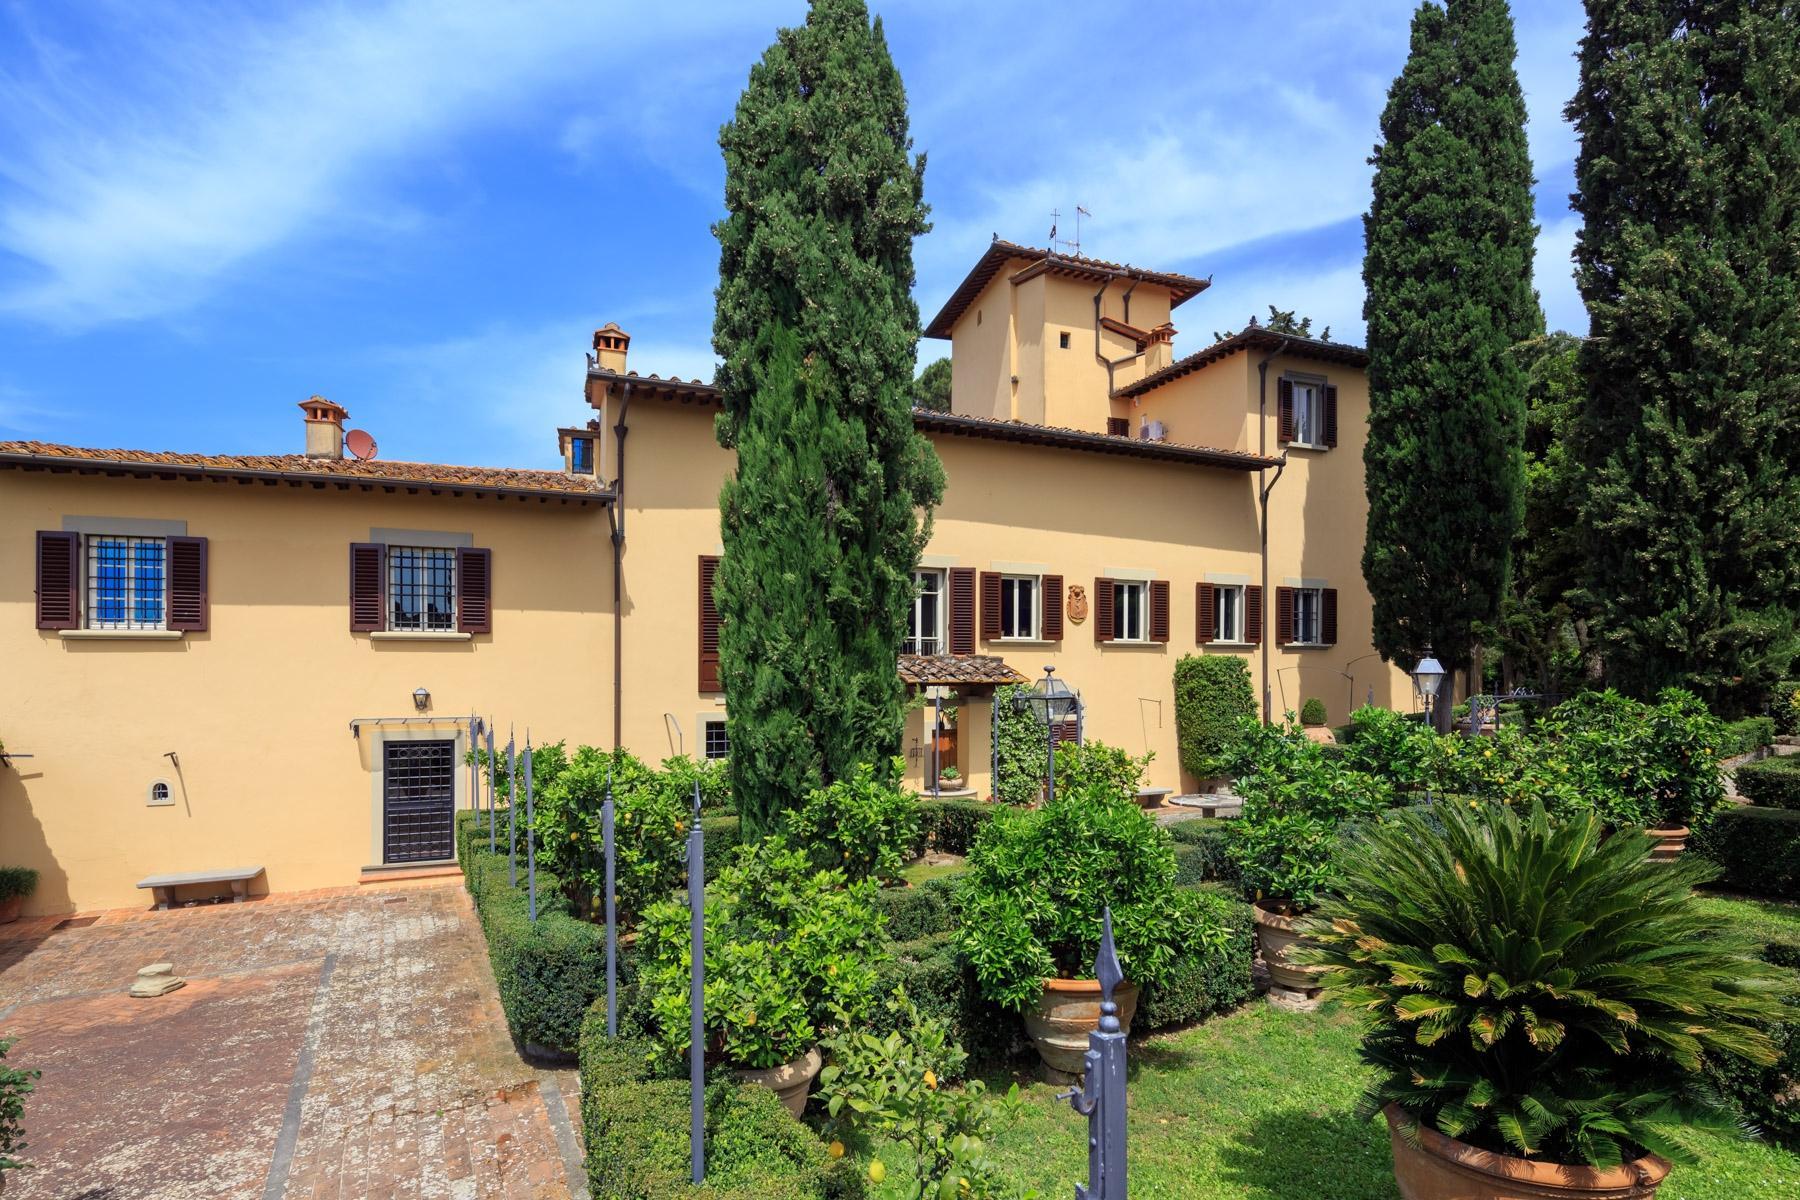 Pregevole villa Cinquecentesca - 4